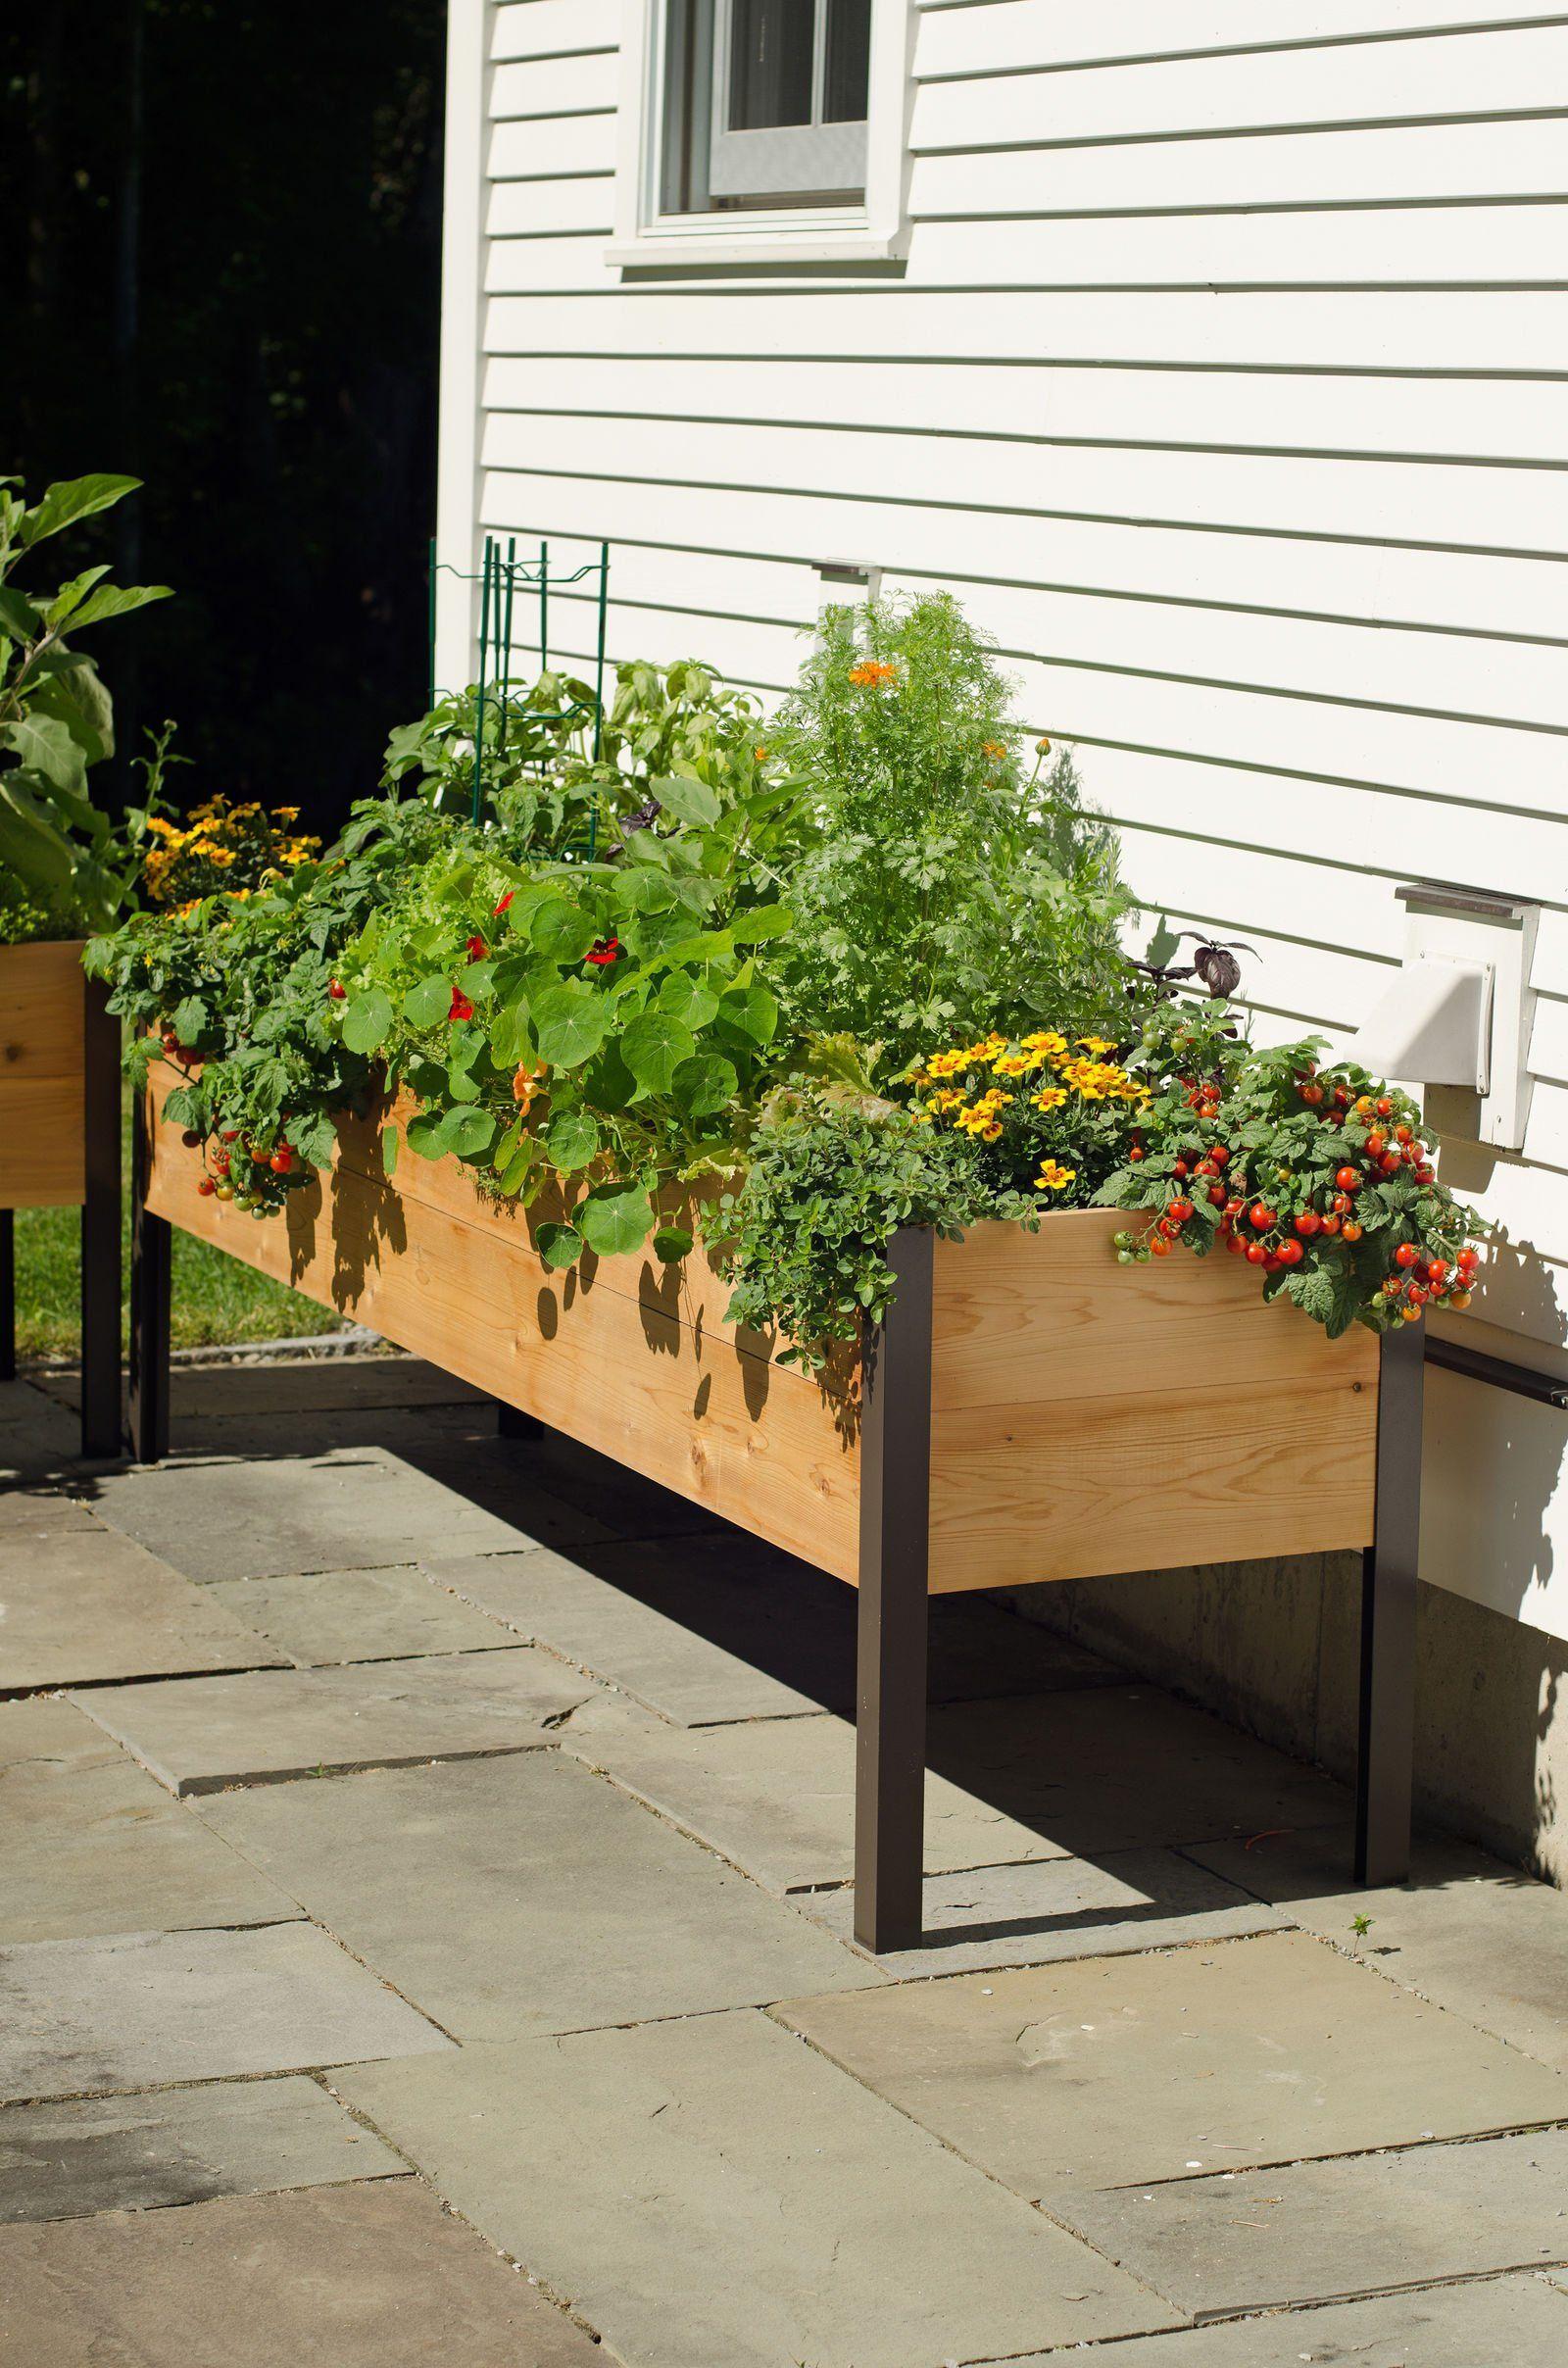 2 39 X 8 39 Elevated Cedar Planter Box Raised